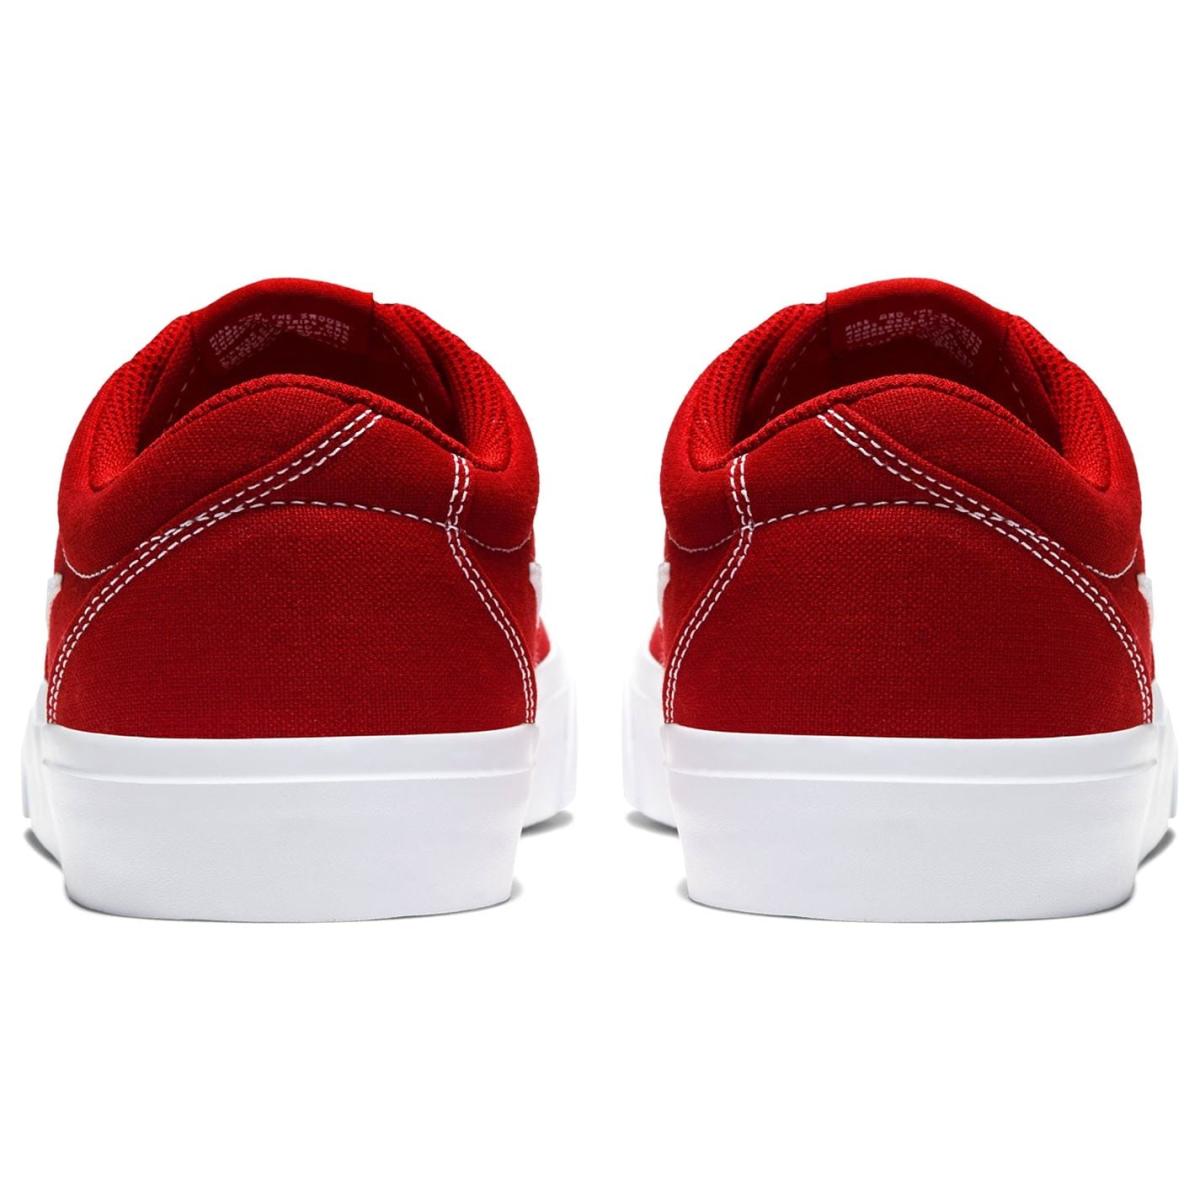 Nike-SB-Lot-Solarsoft-Skate-Chaussures-Messieurs-Skater-Chaussures-De-Sport-Skate-2162 miniature 56